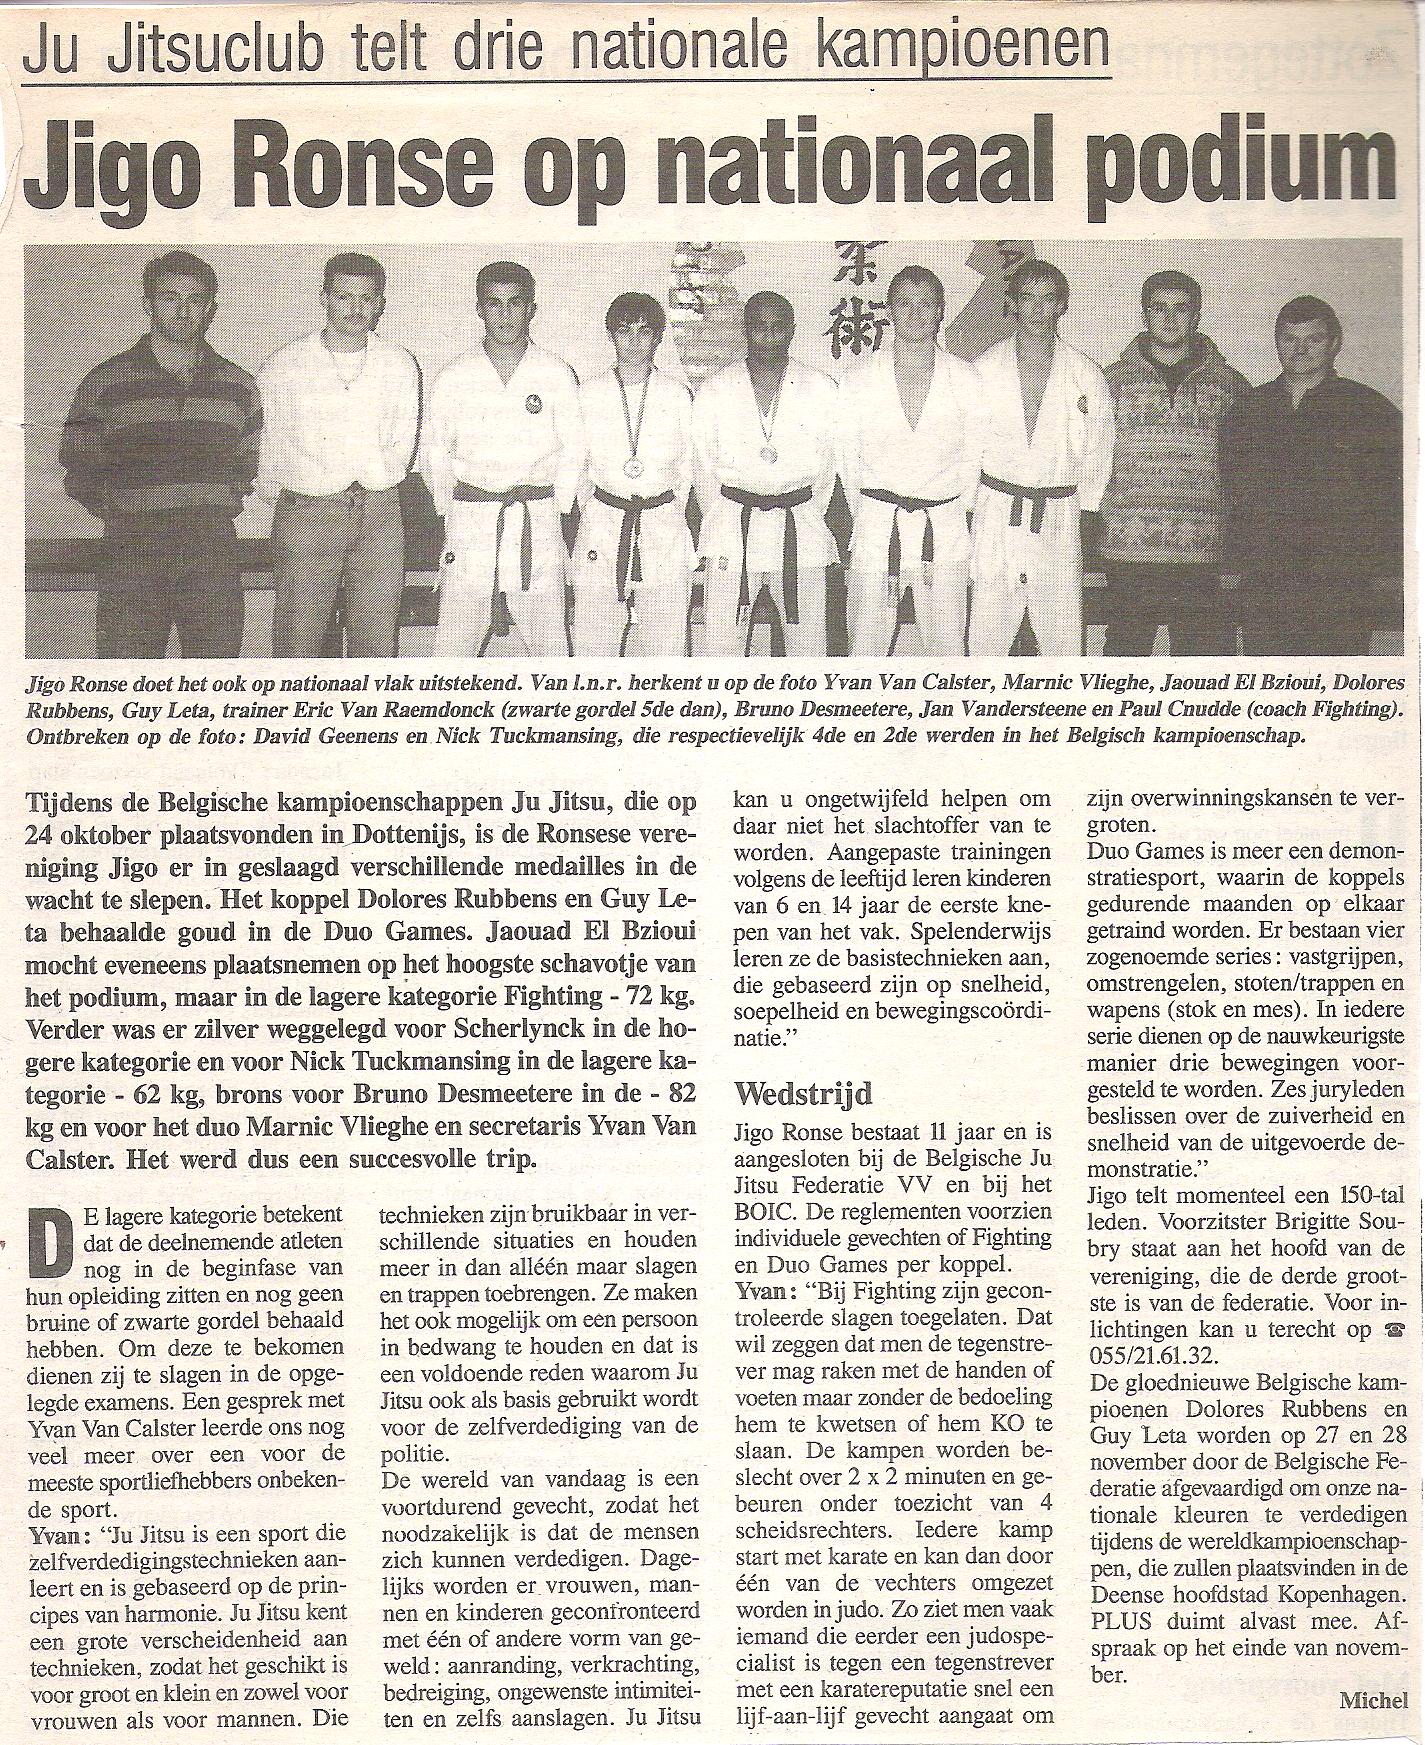 Jigo Ronse op nationaal podium